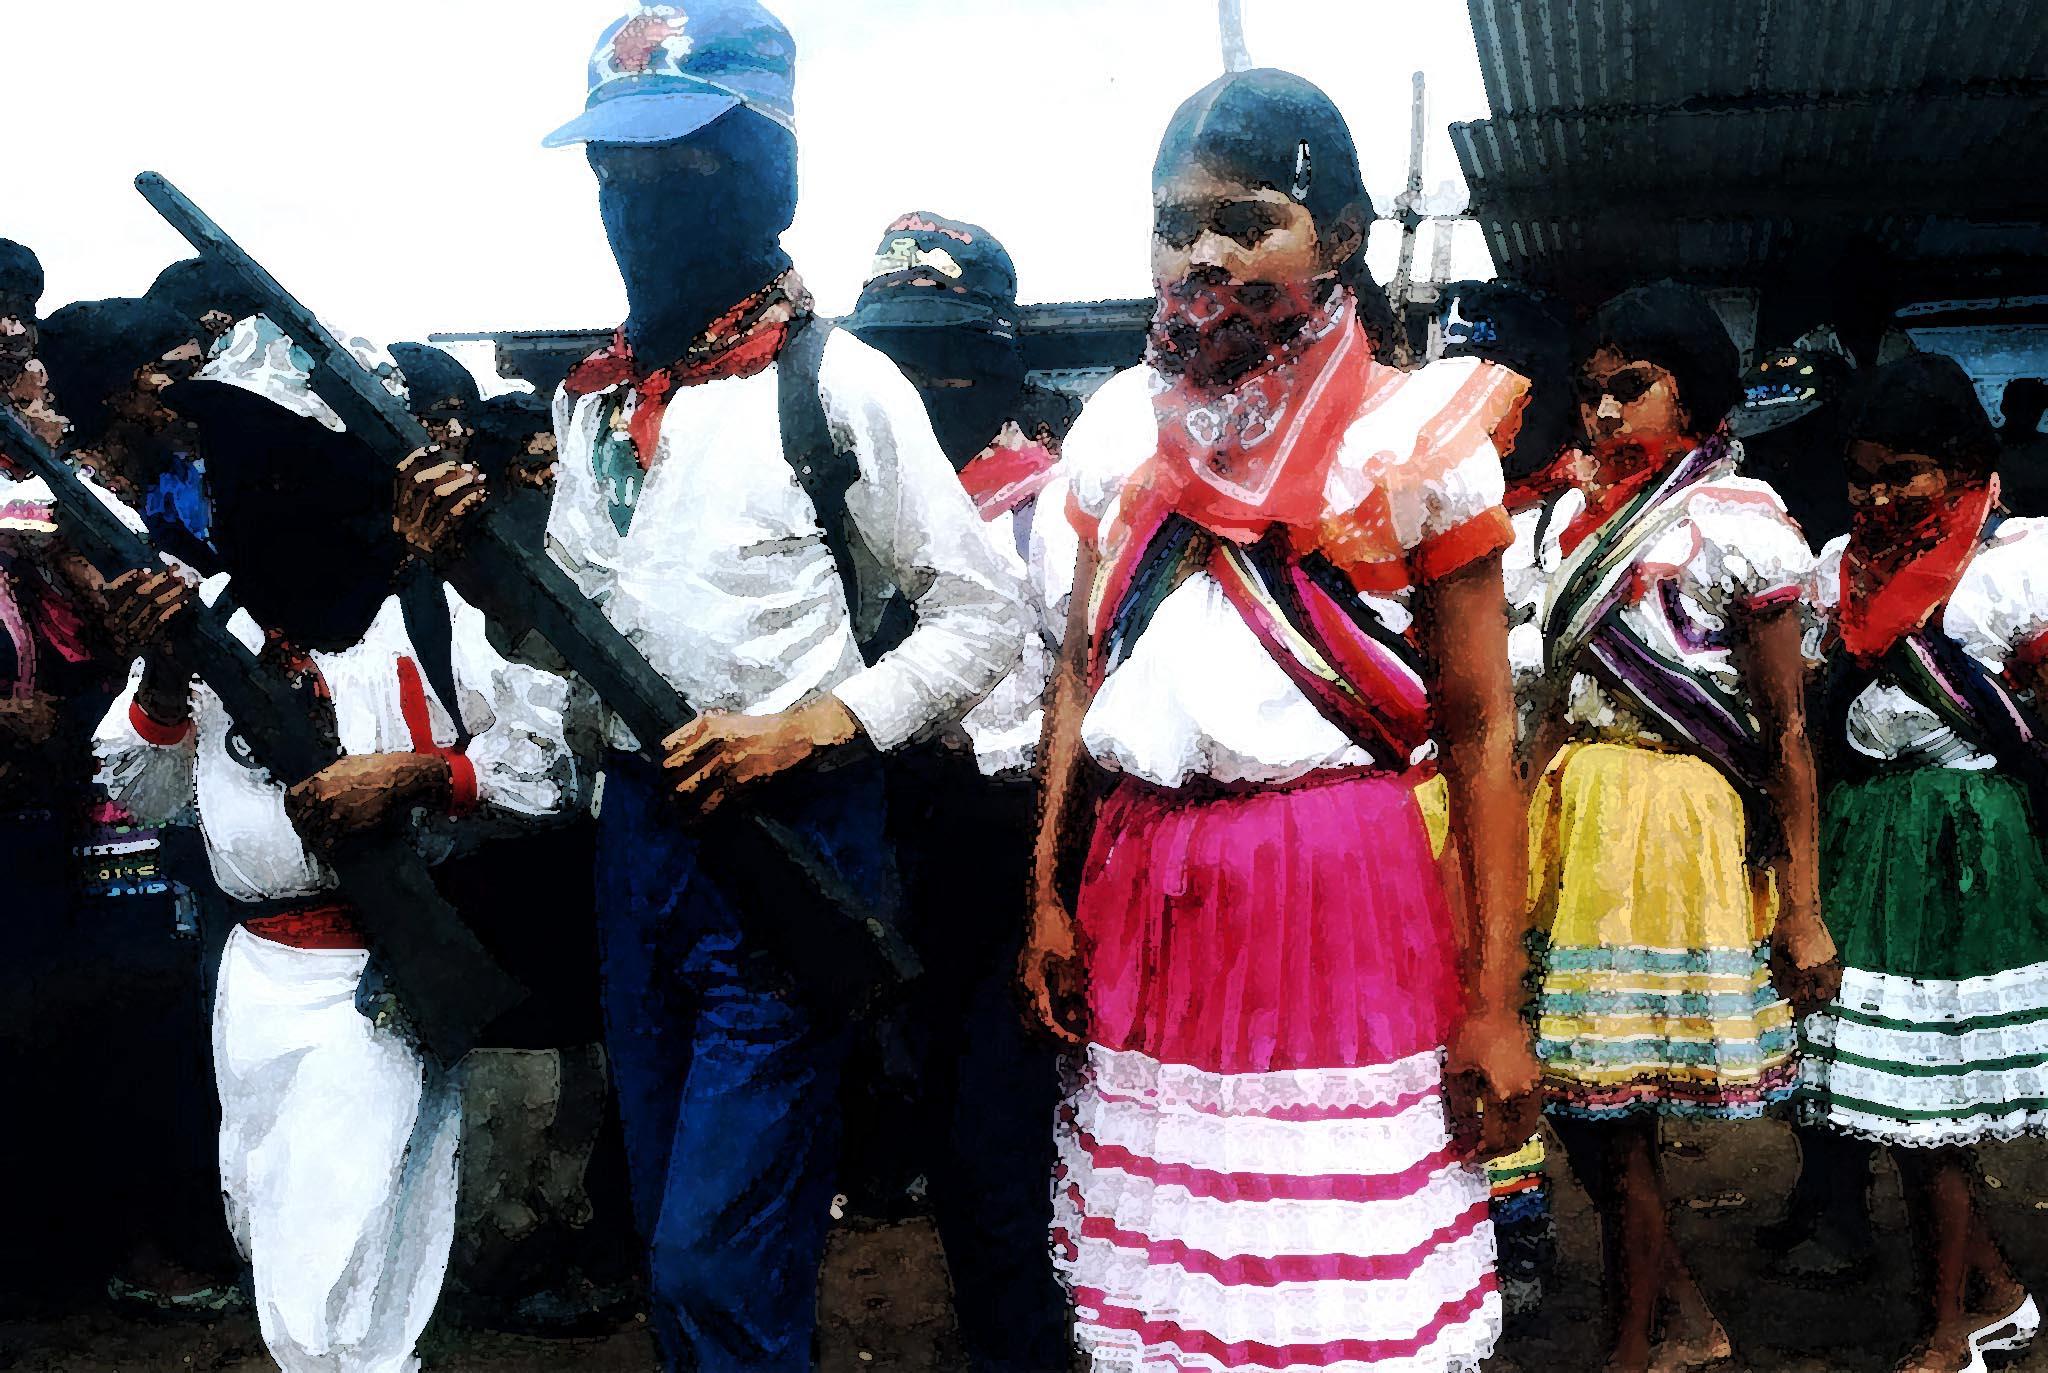 Jovenes zapatistas, 1997